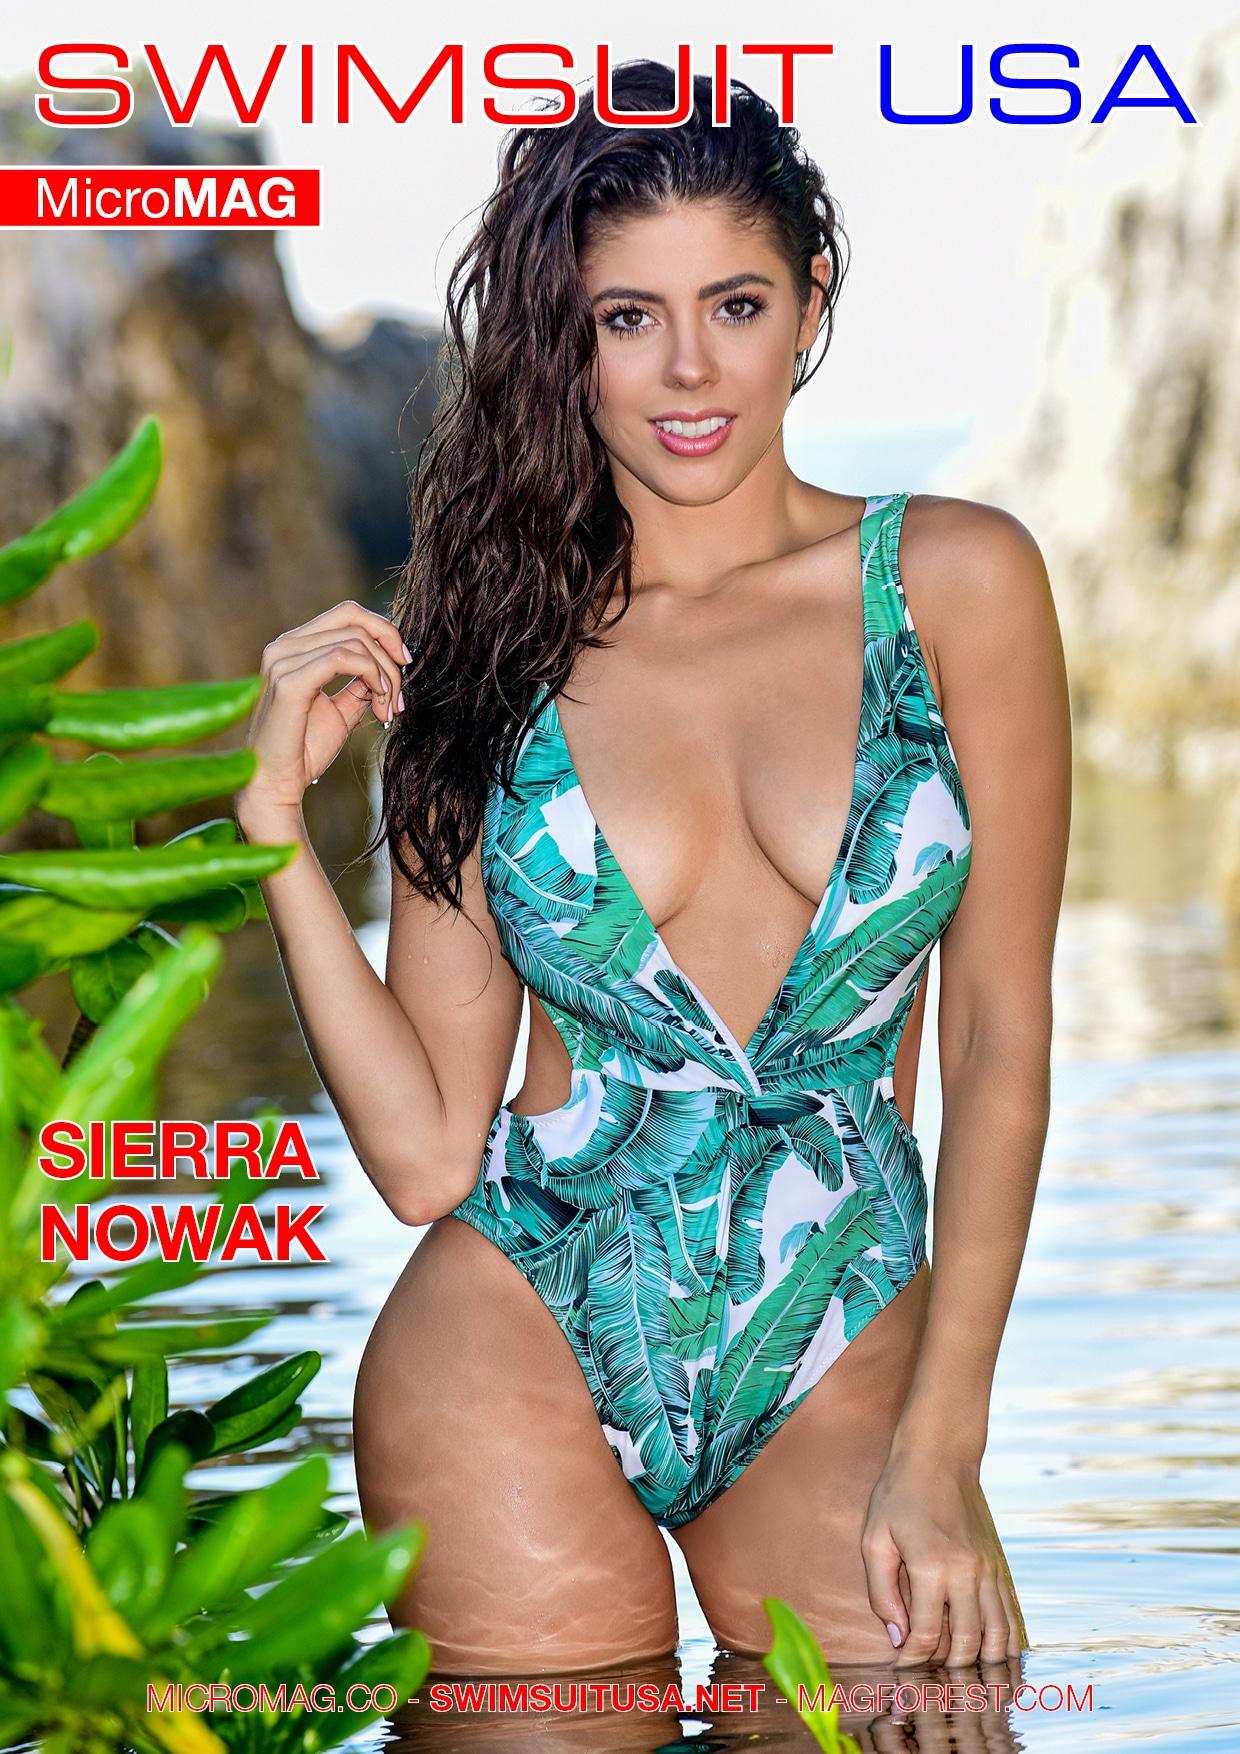 Swimsuit USA MicroMAG - Sierra Nowak - Issue 4 1